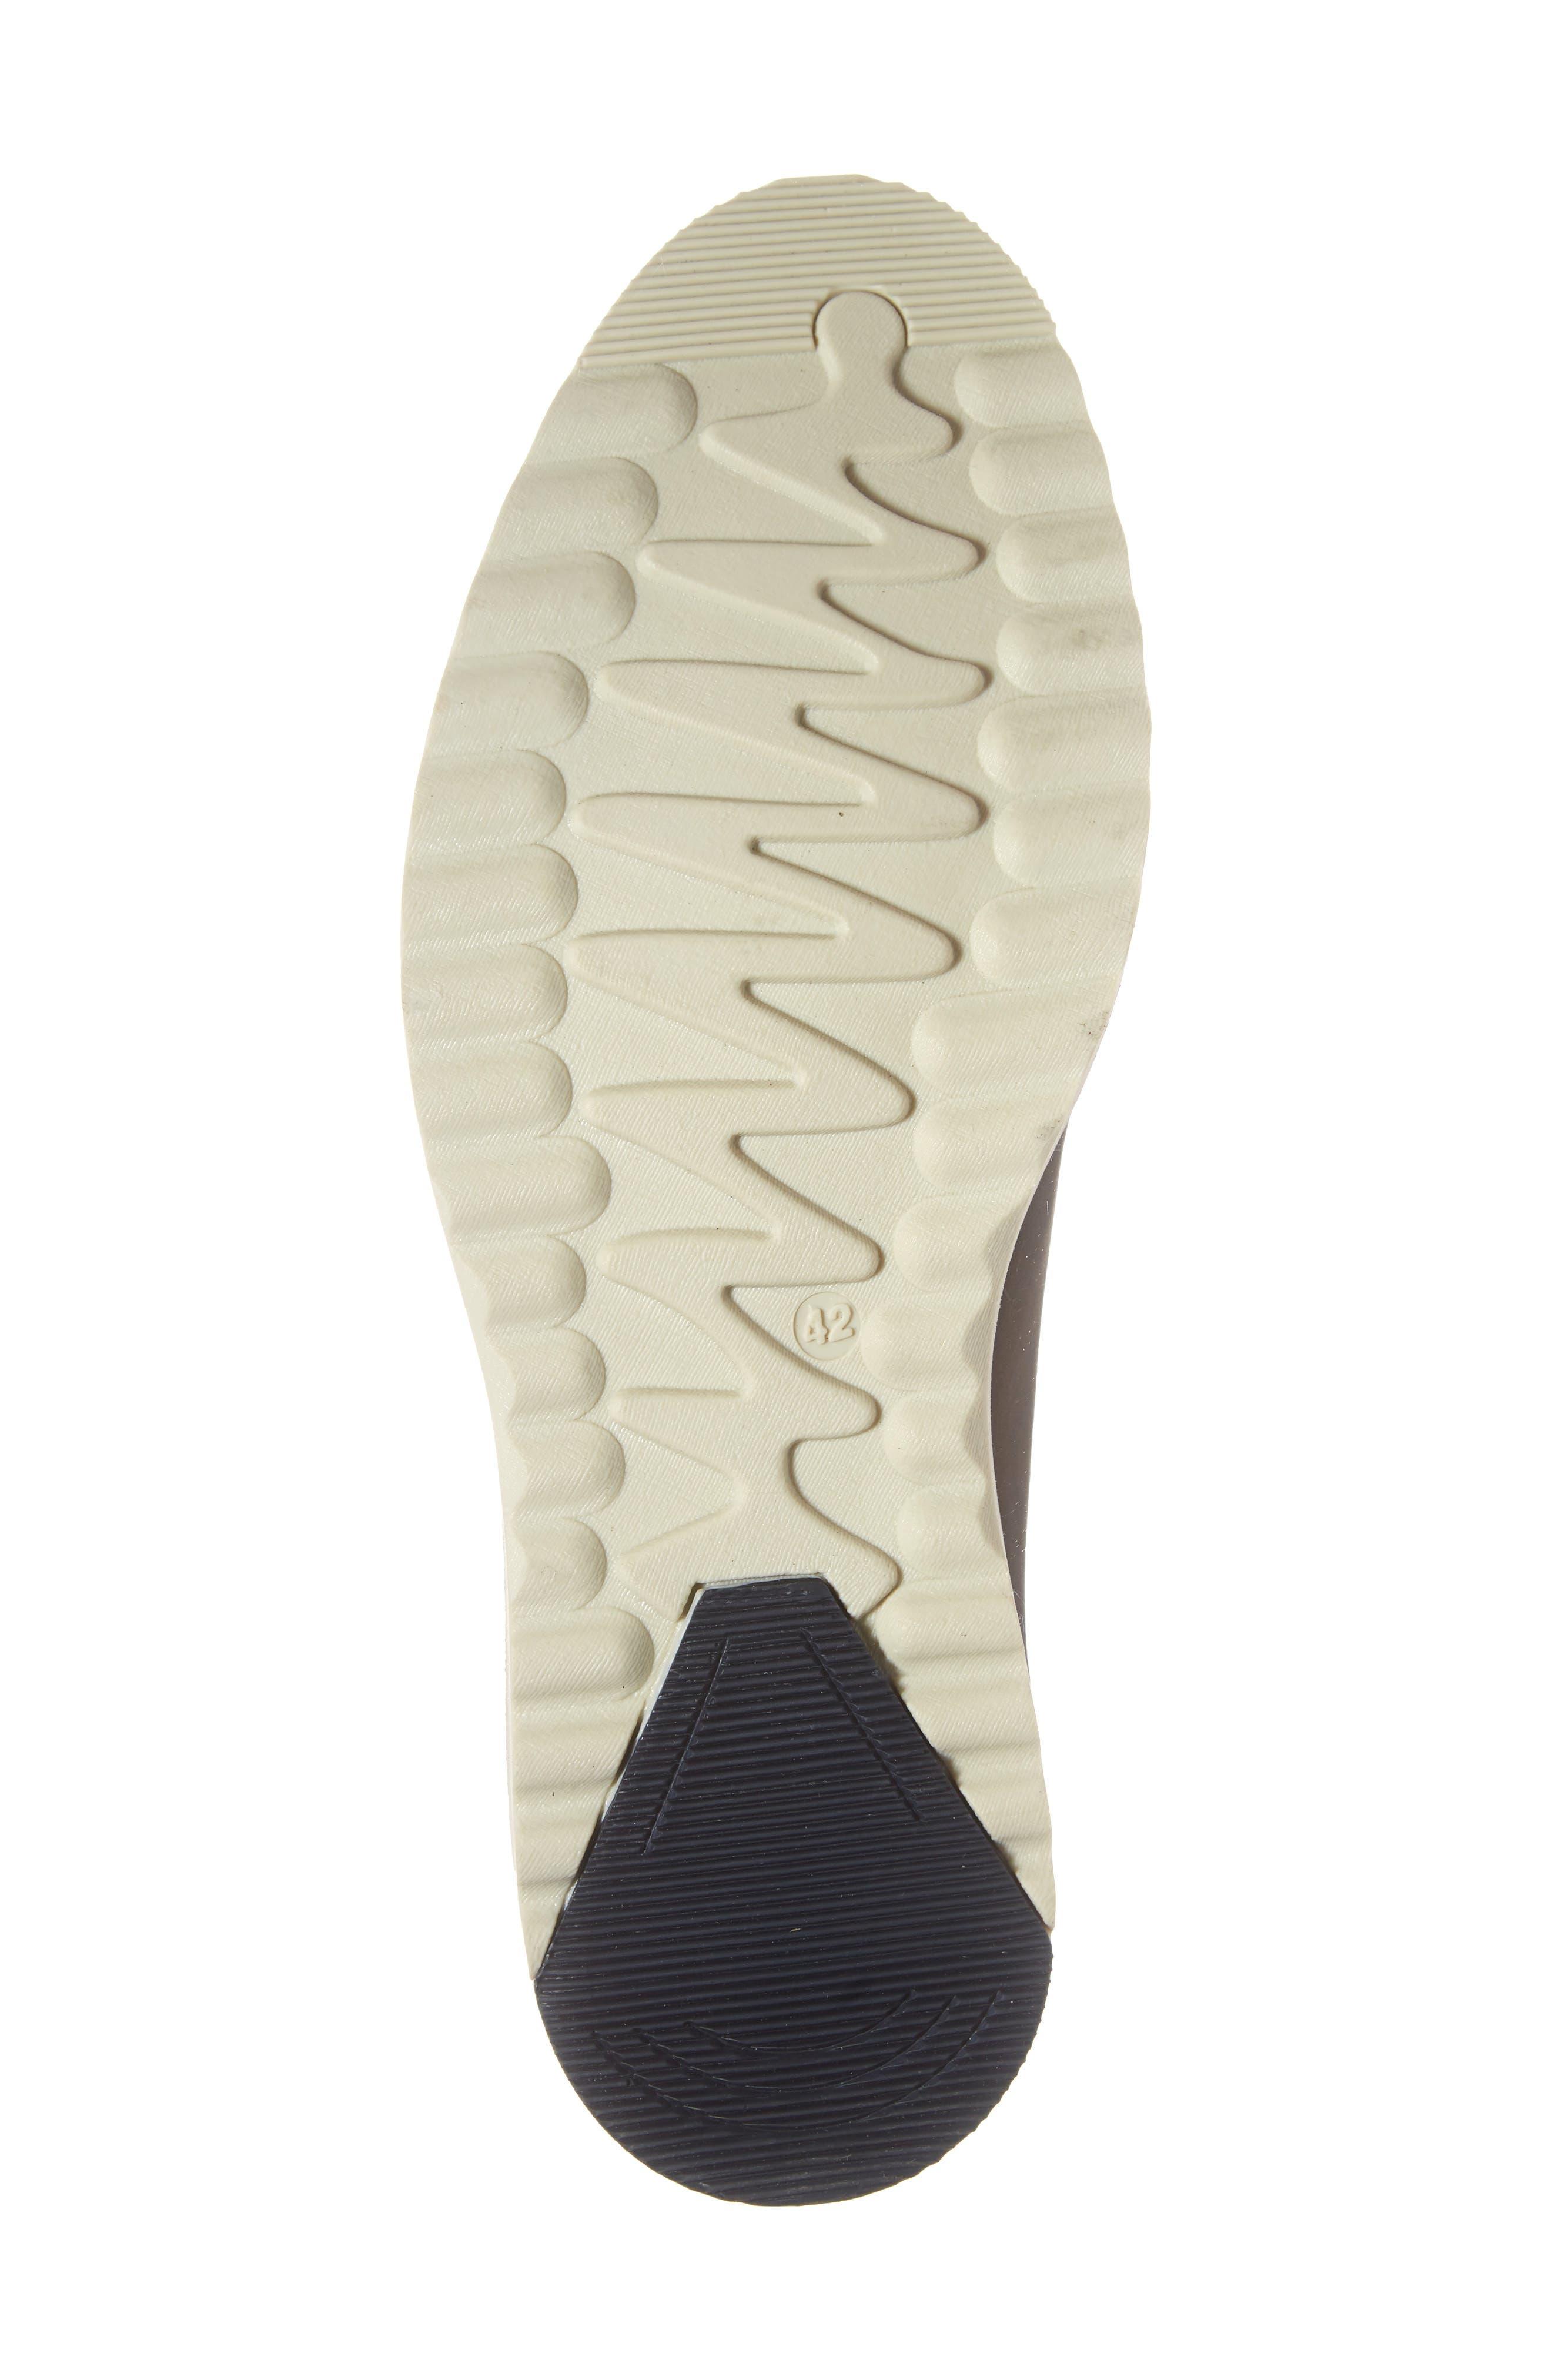 Oscar Plain Toe Boot,                             Alternate thumbnail 6, color,                             201